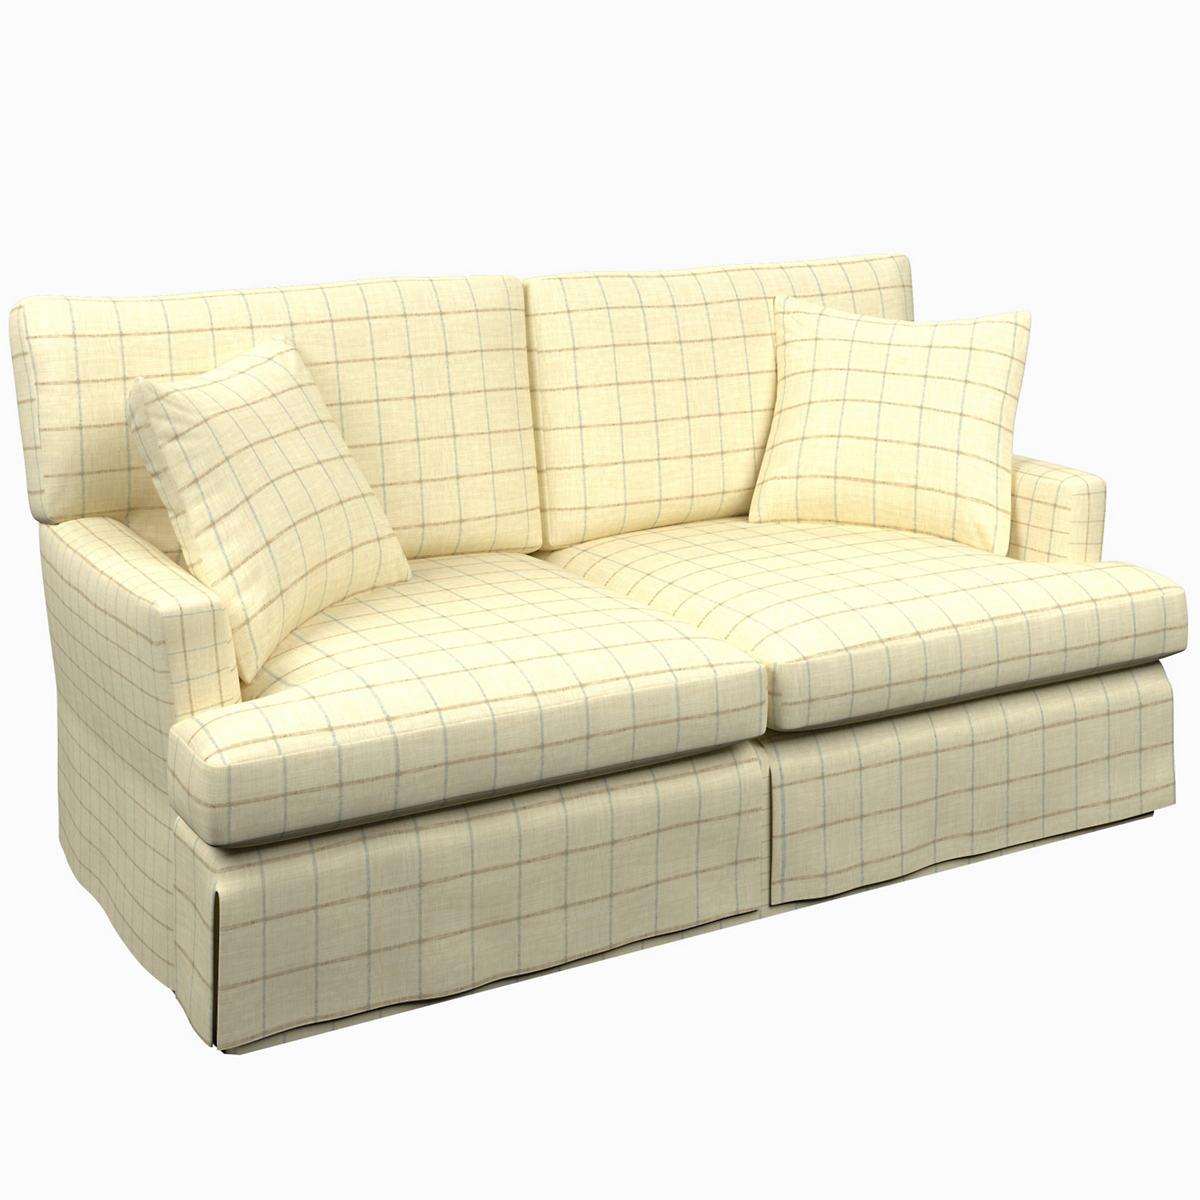 Chatham Tattersall Light Blue/Natural Saybrook 2 Seater Sofa